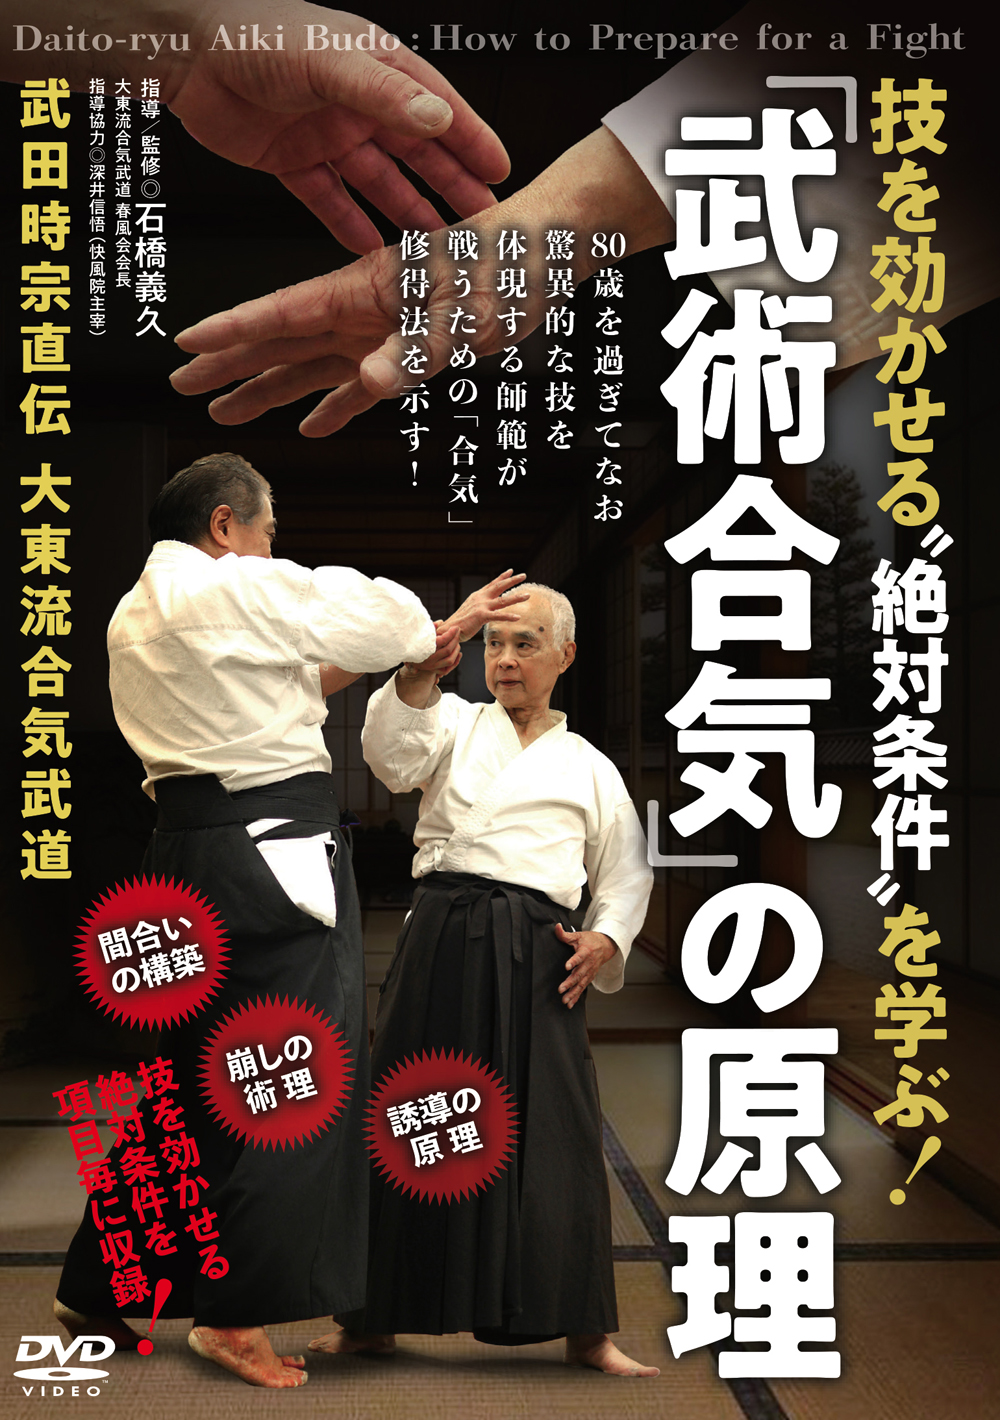 DVD 「武術合気」の原理